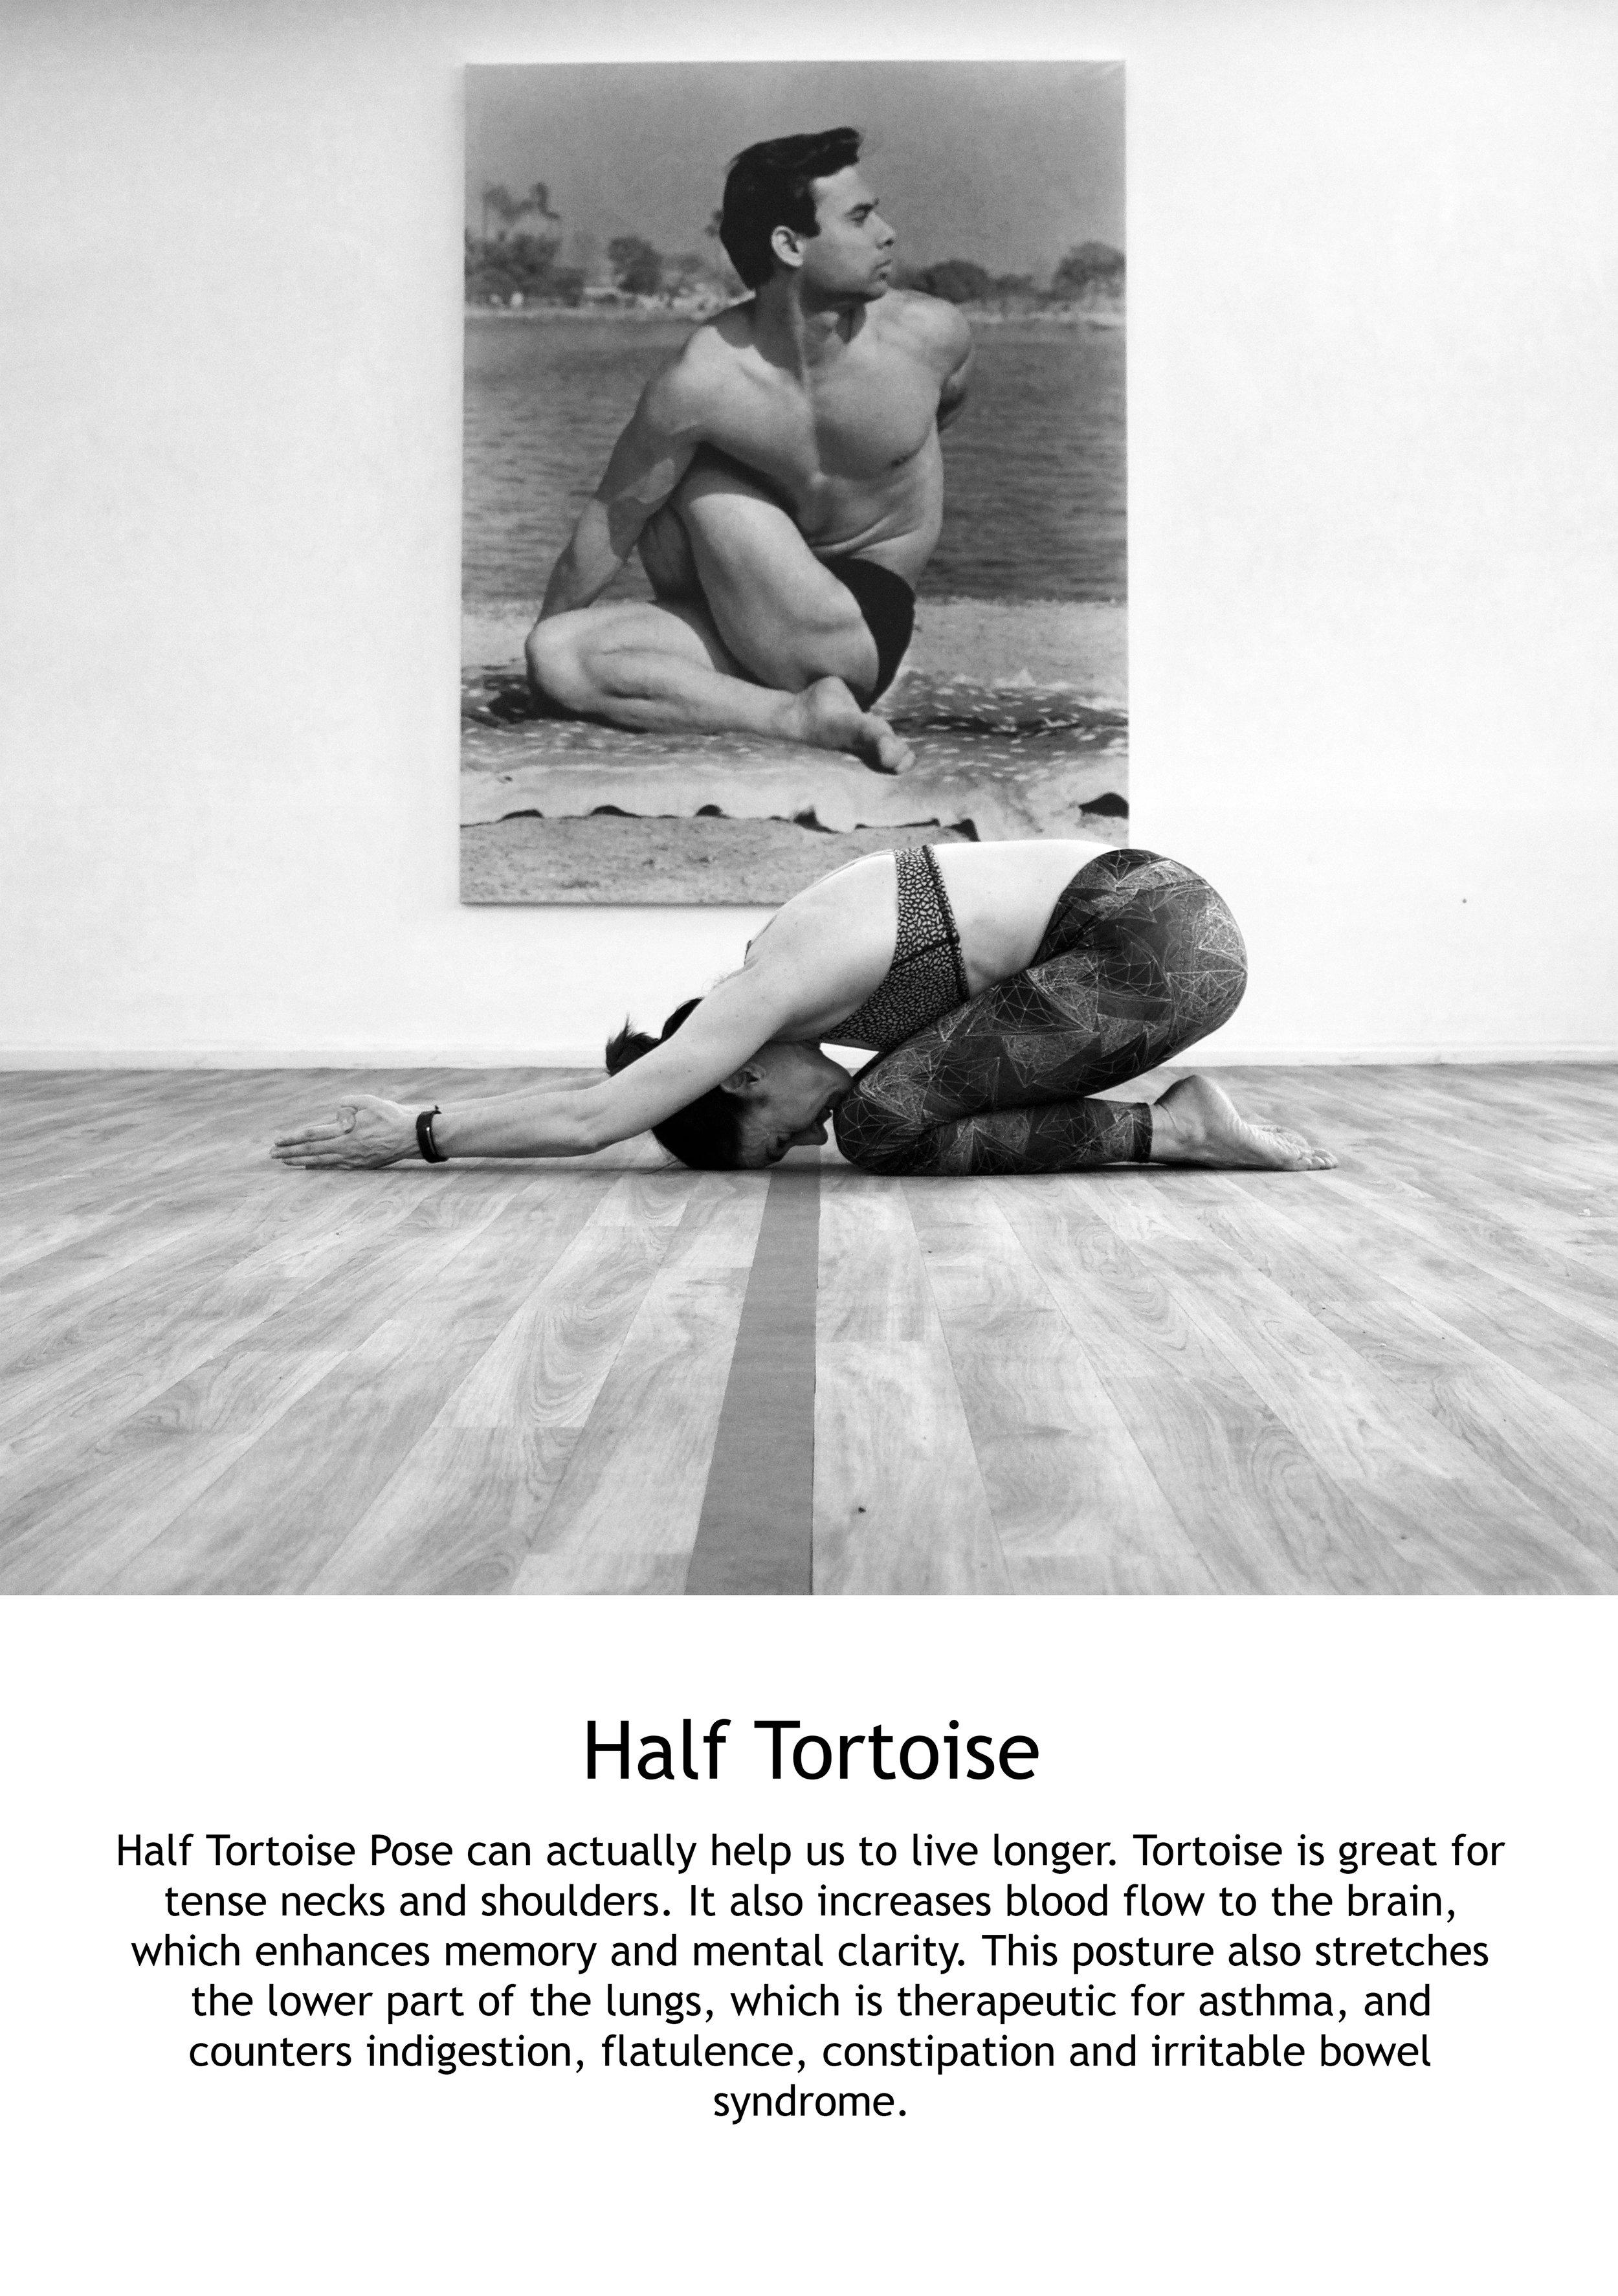 Half Tortoise